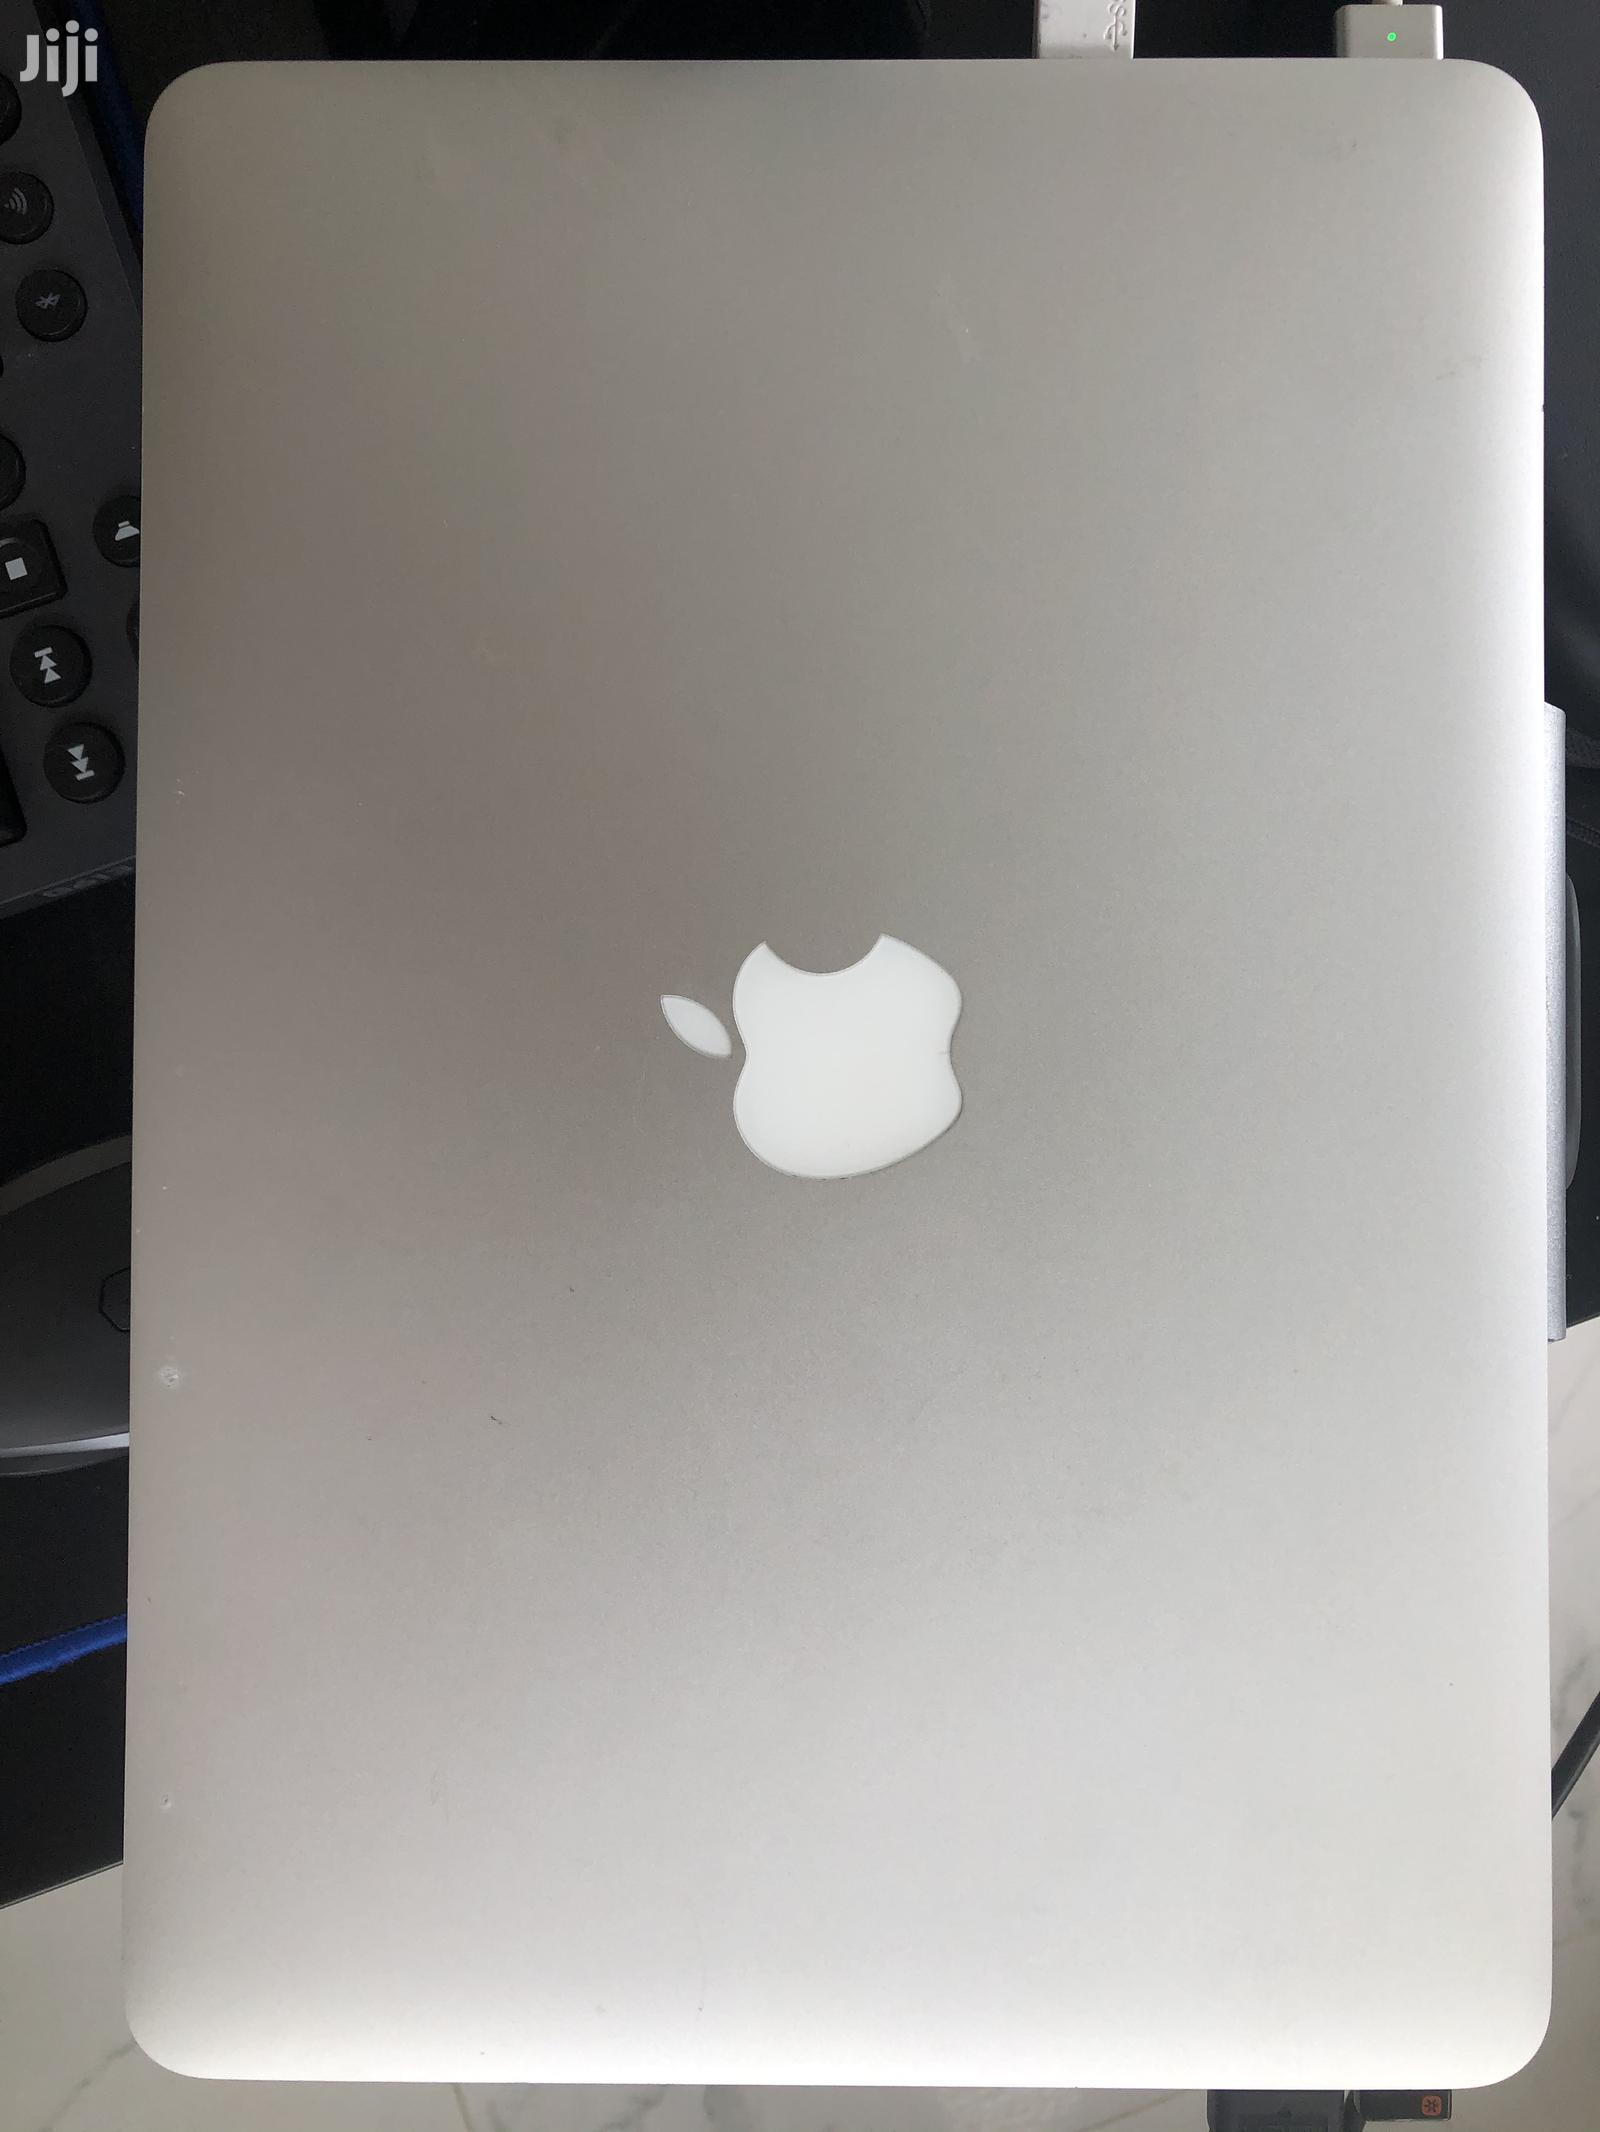 Laptop Apple MacBook 2014 8GB Intel Core I5 SSD 640GB   Laptops & Computers for sale in Kinondoni, Dar es Salaam, Tanzania